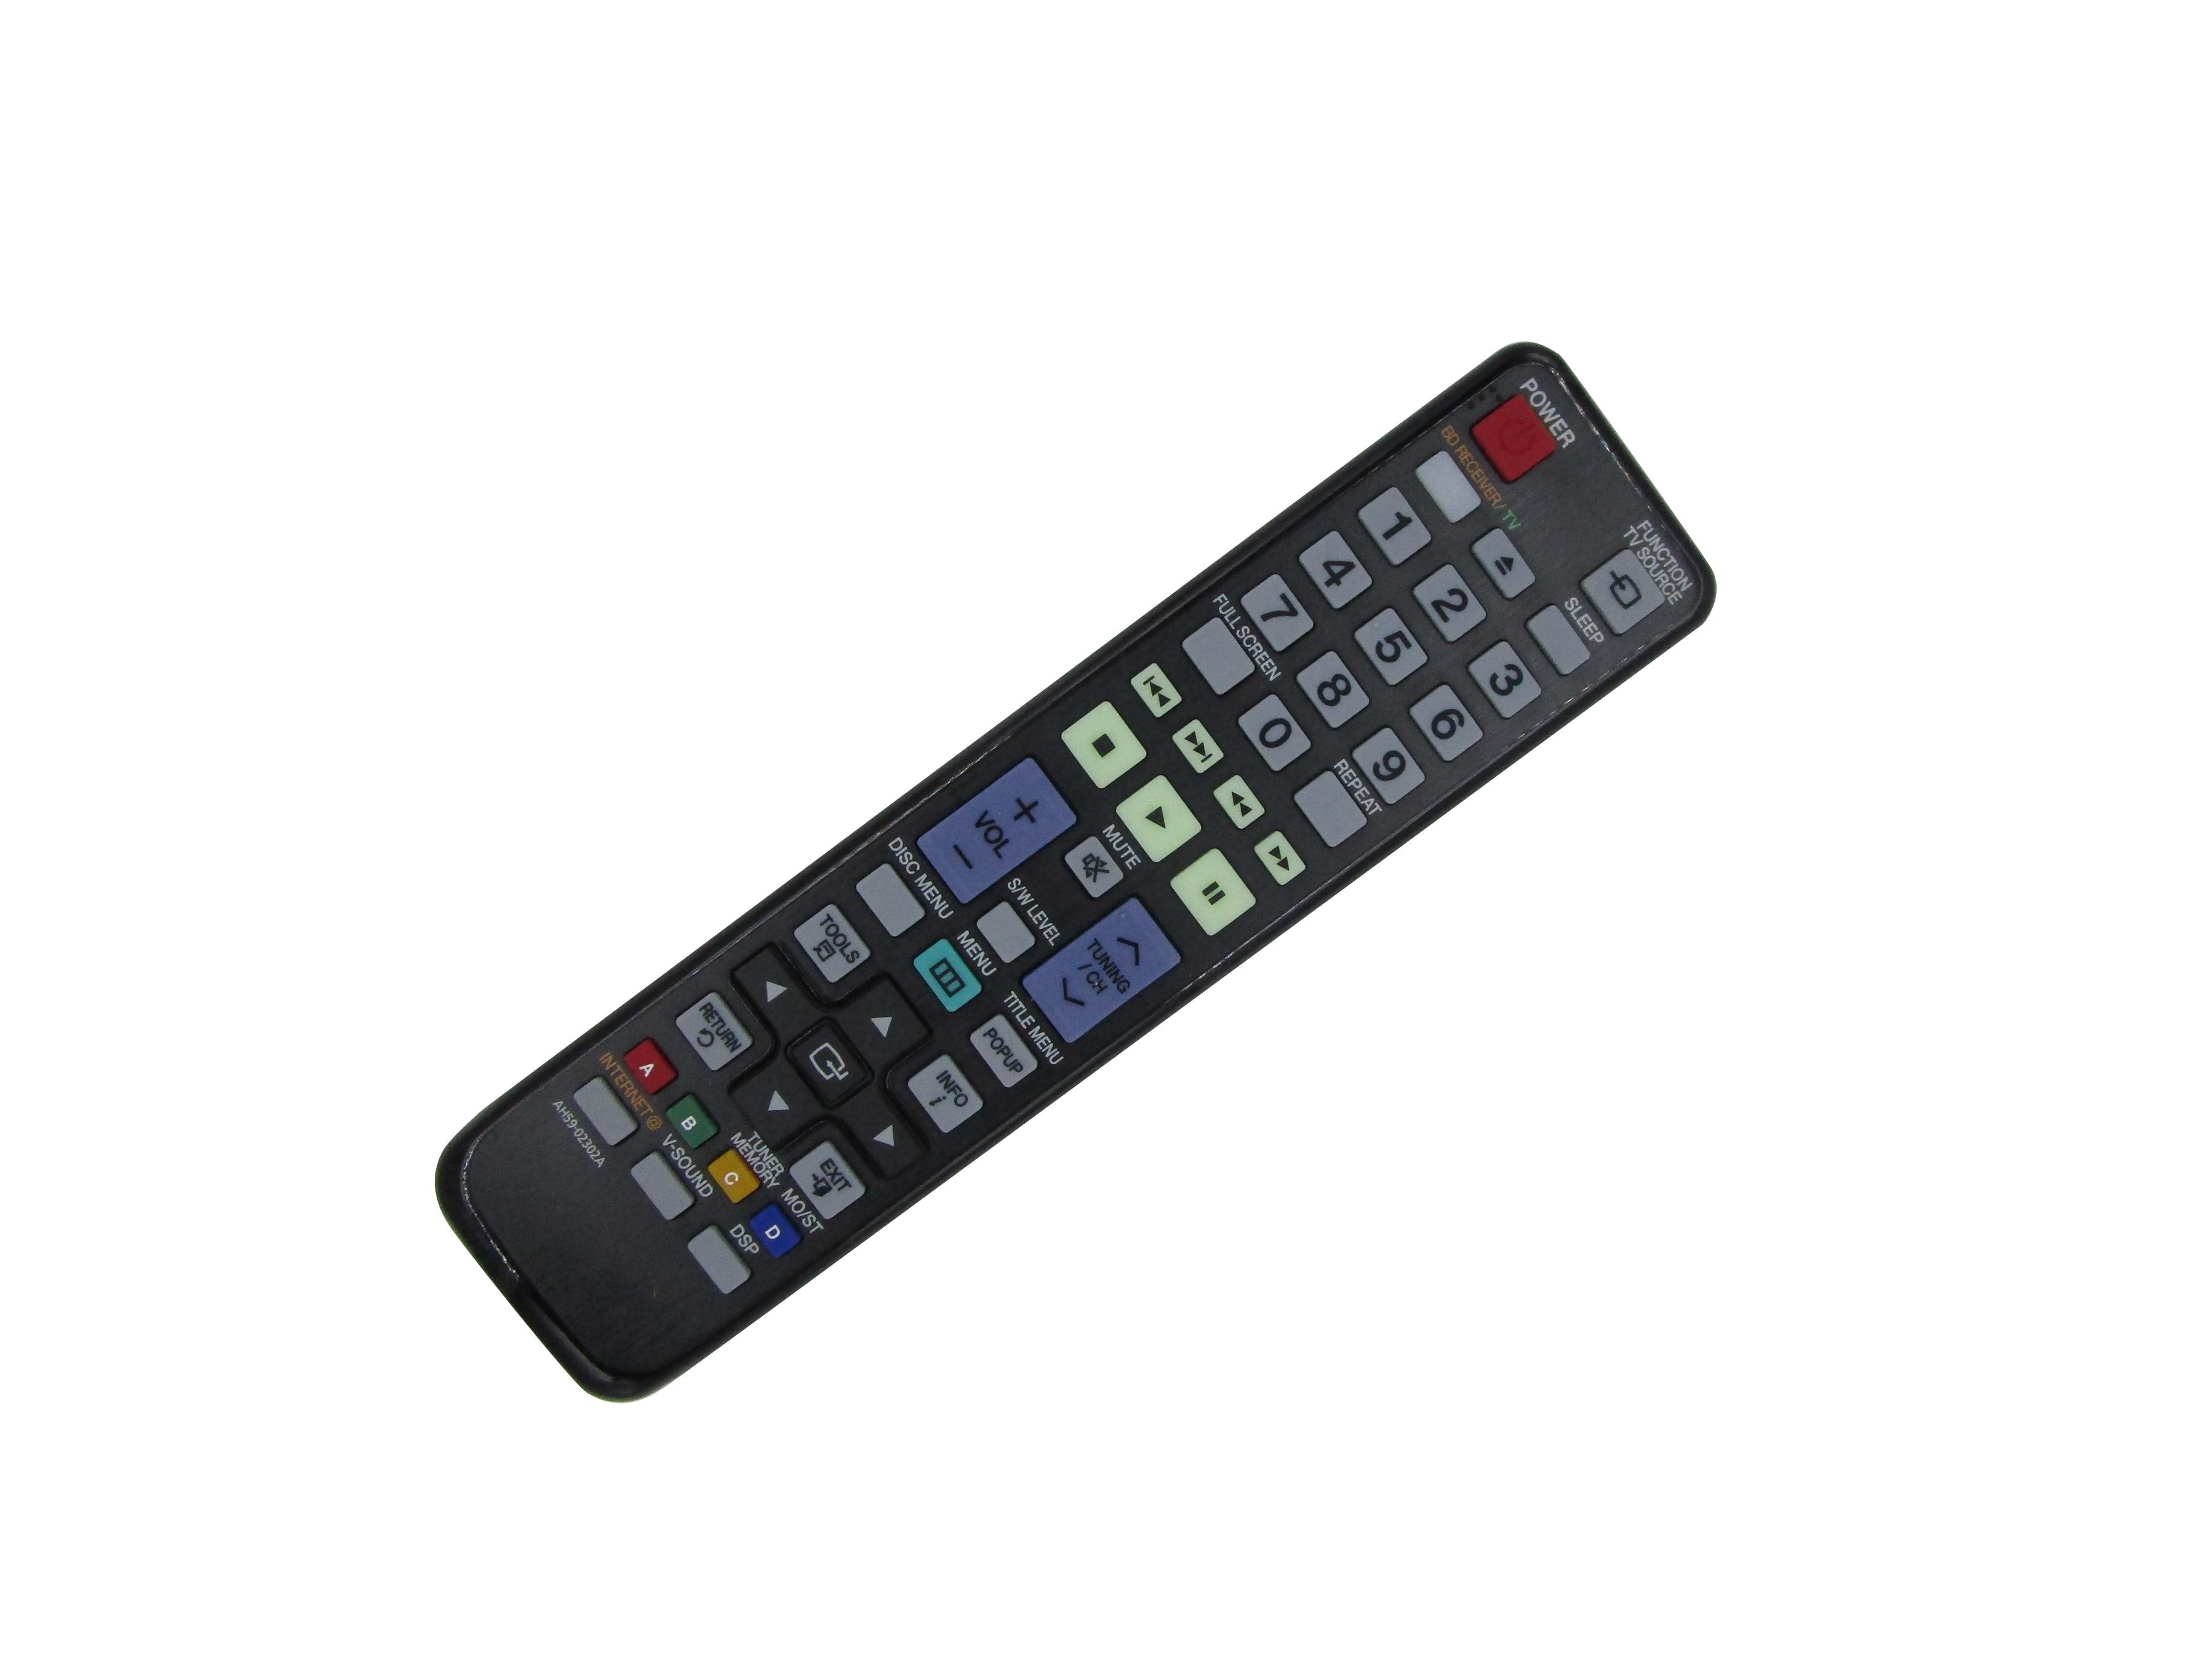 Remote Control For Samsung AH59-02303A HT-C5200 HT-C5800 HT-C6200 HT-C6800 HT-C7200 HT-C7300 DVD Hom